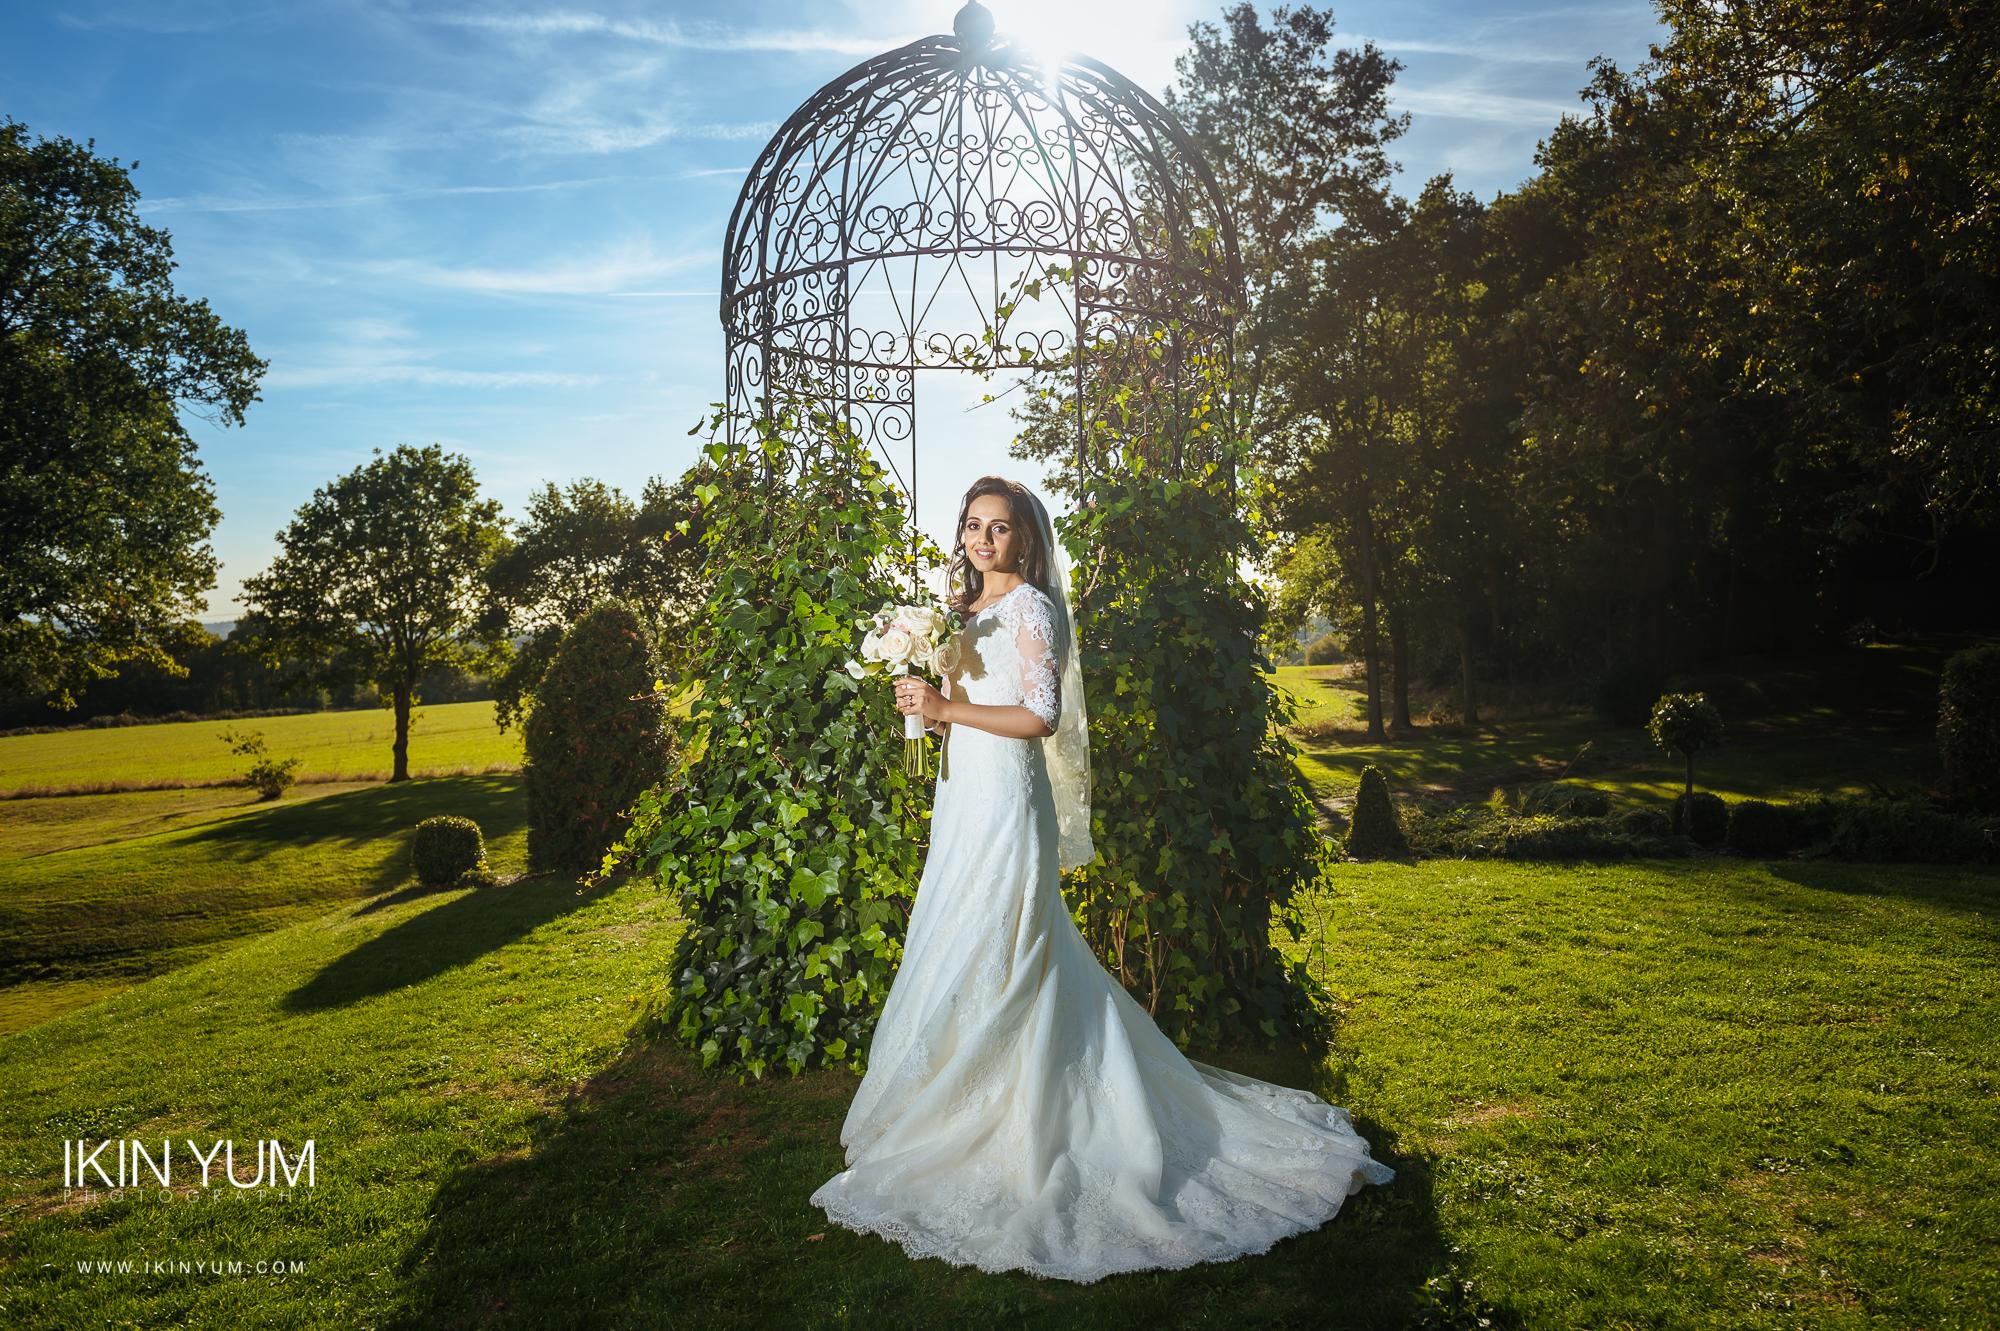 Laura Ashley Manor Wedding - Ikin Yum Photography-102.jpg